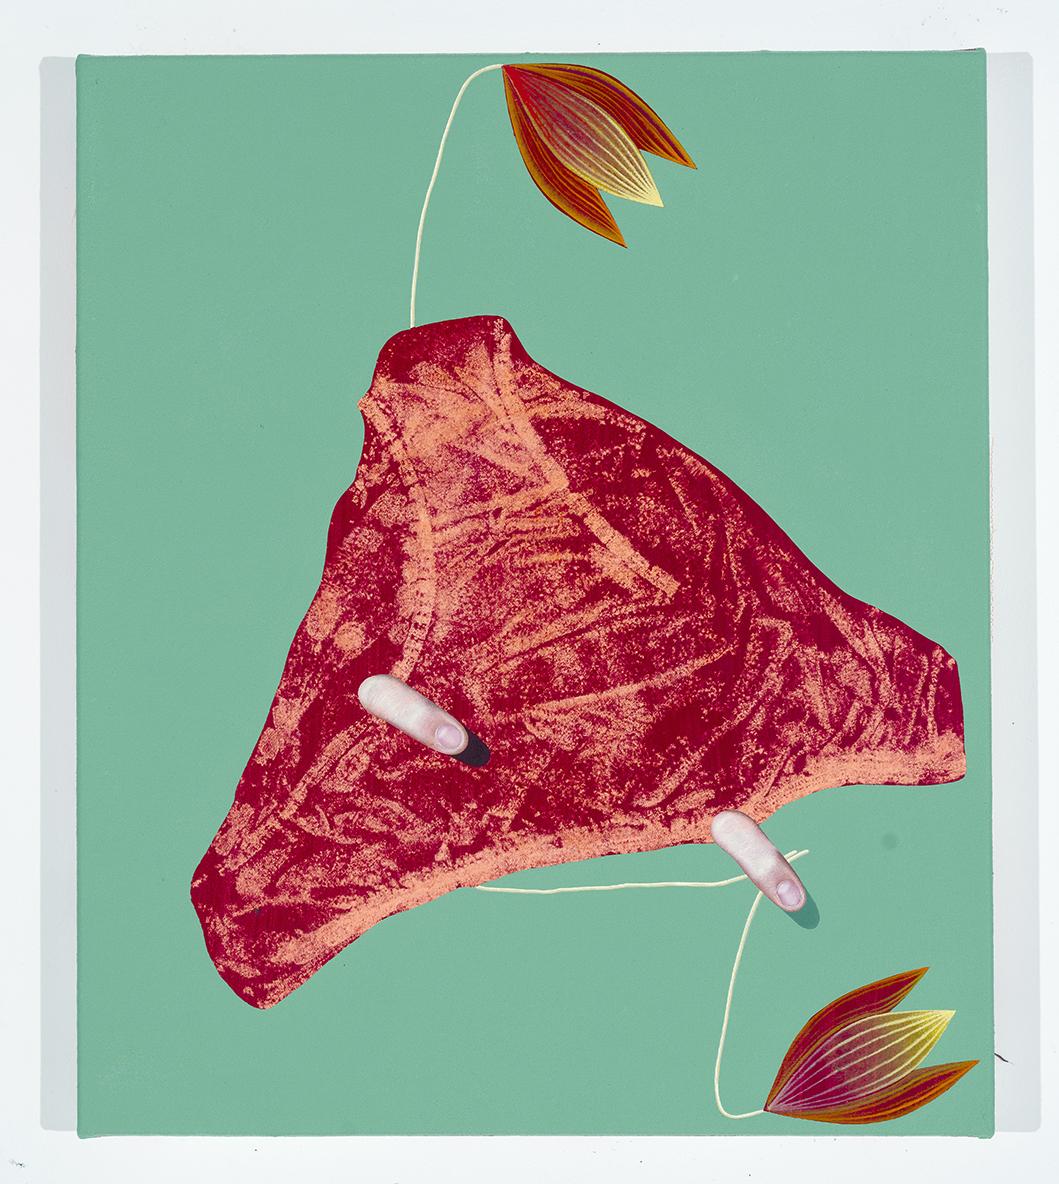 Canadian Art   Veronika Pausova Paints a Spidery Sublime